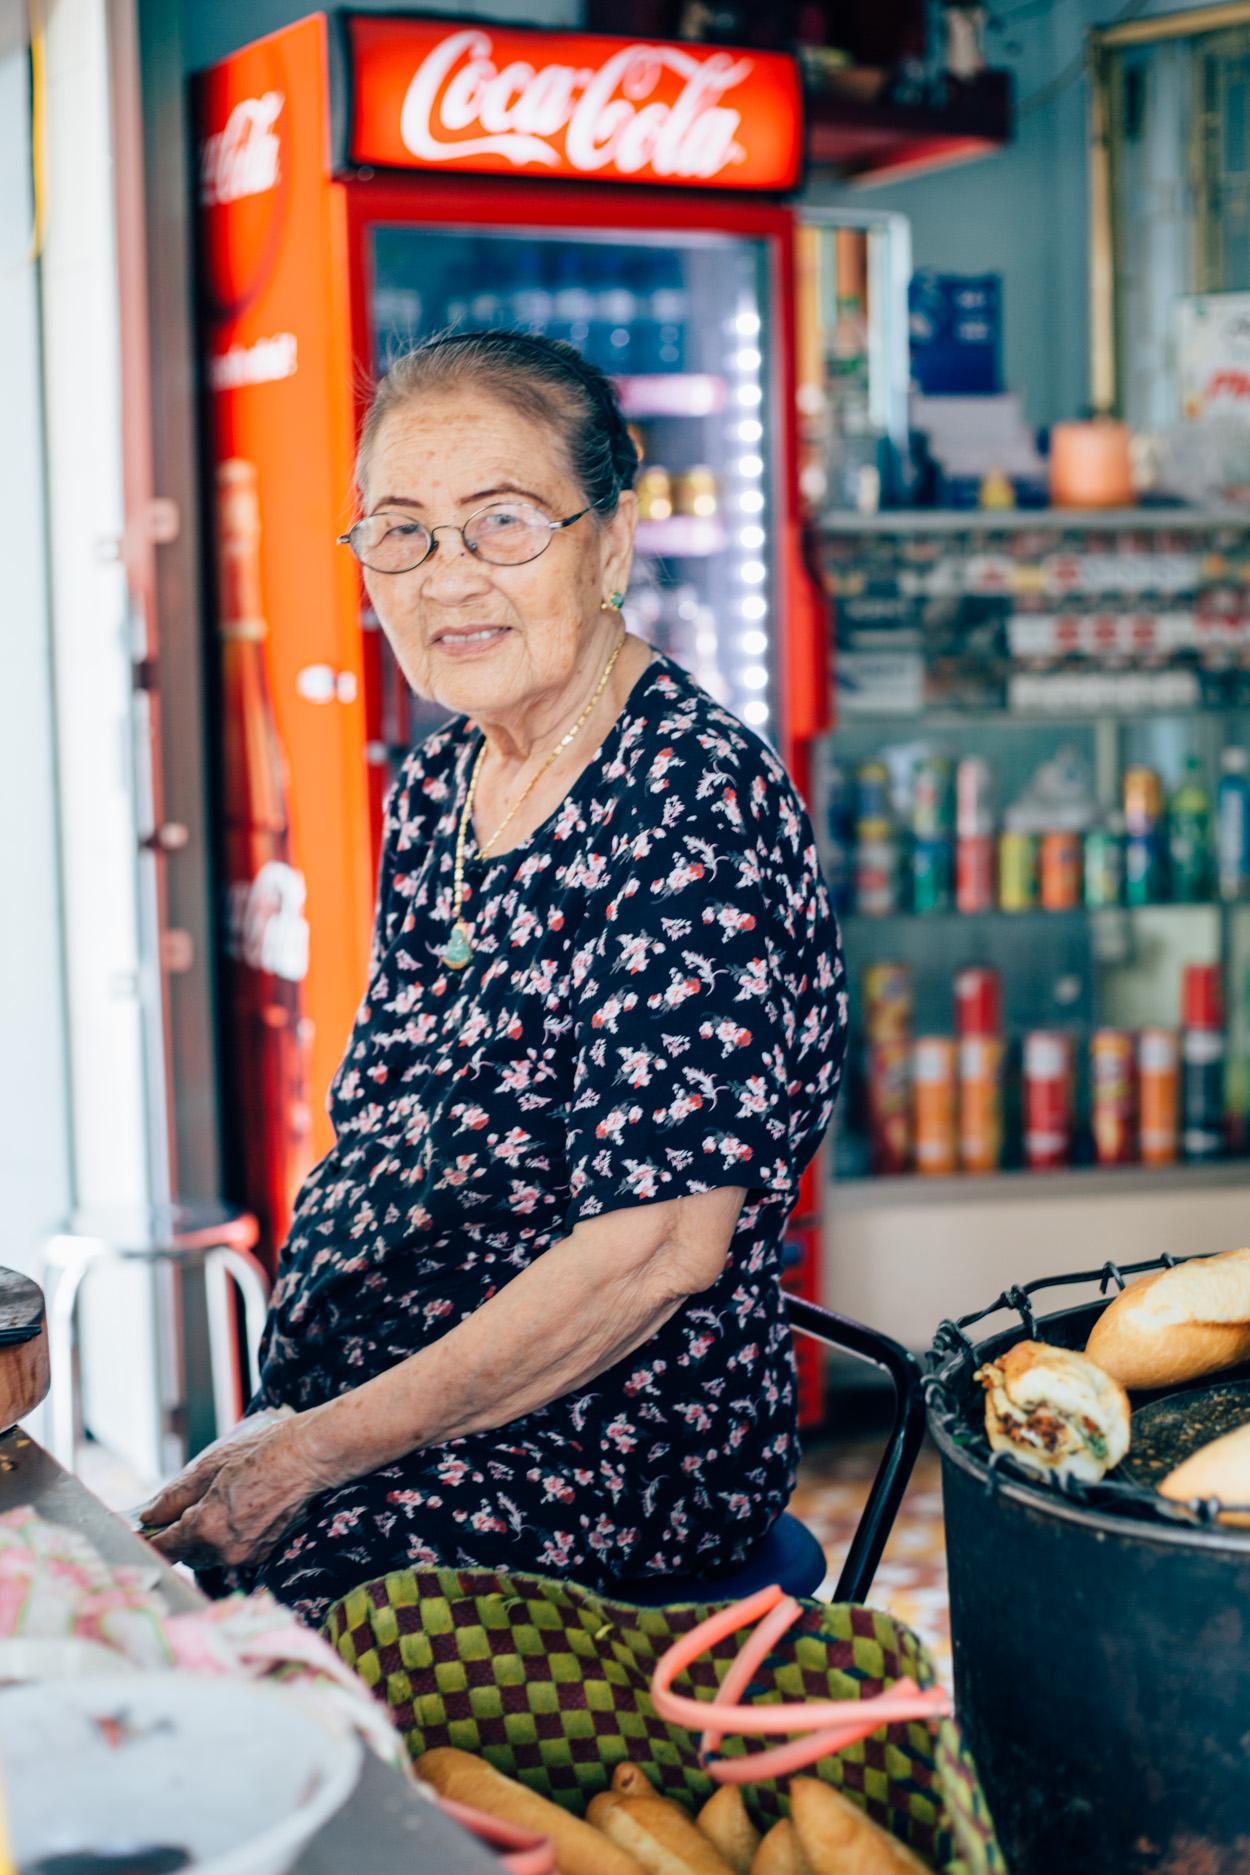 Madam KhanhBanh Mi Queen - The best Bánh Mì you will get in Hoi An115 Trần Cao Vân, Sơn Phong, Tp. Hội An, Quảng Nam, Vietnam